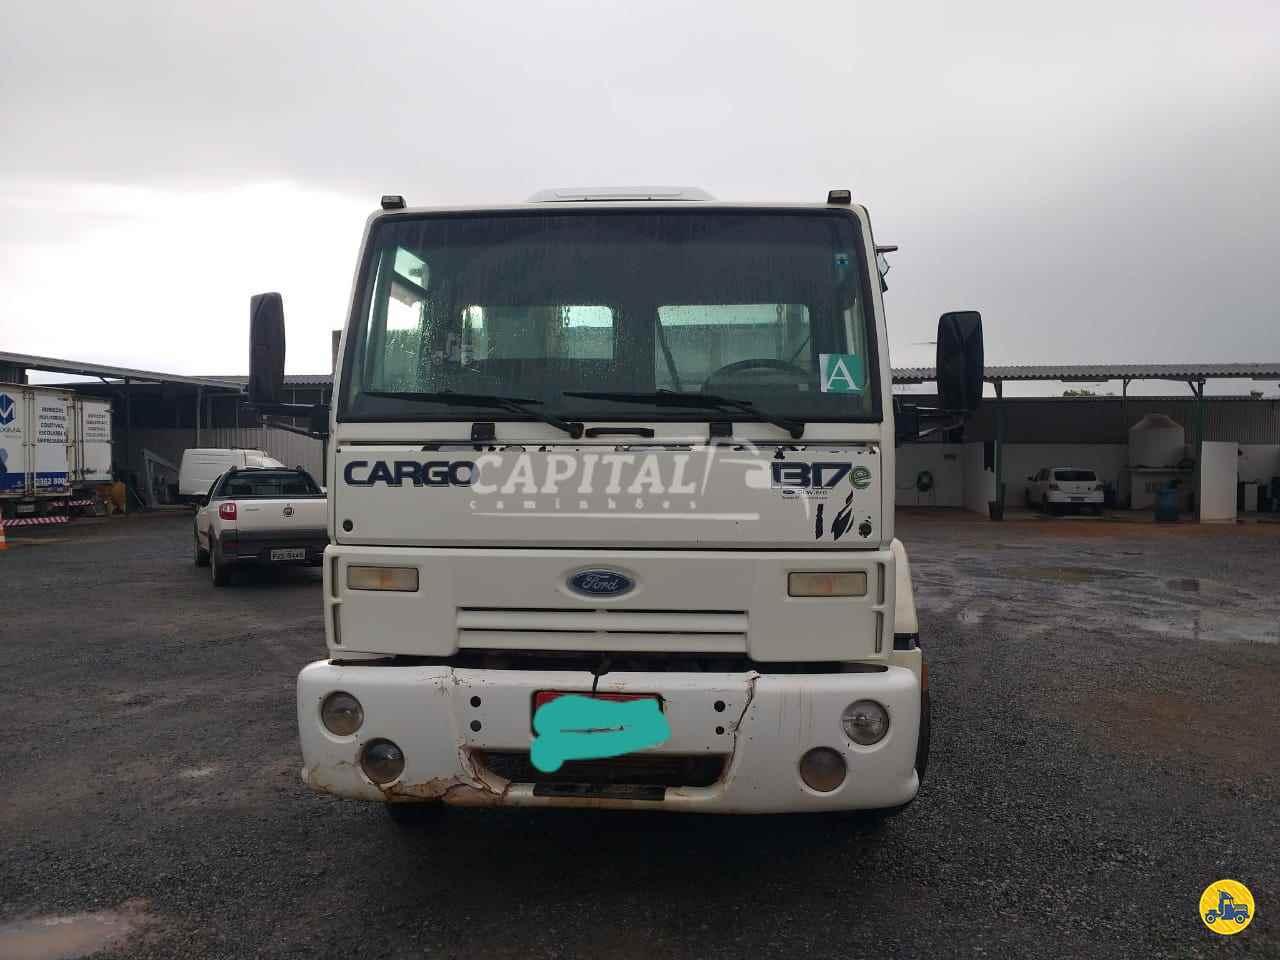 FORD CARGO 1317 350000km 2006/2007 Capital Caminhões - Metalesp e Recrusul